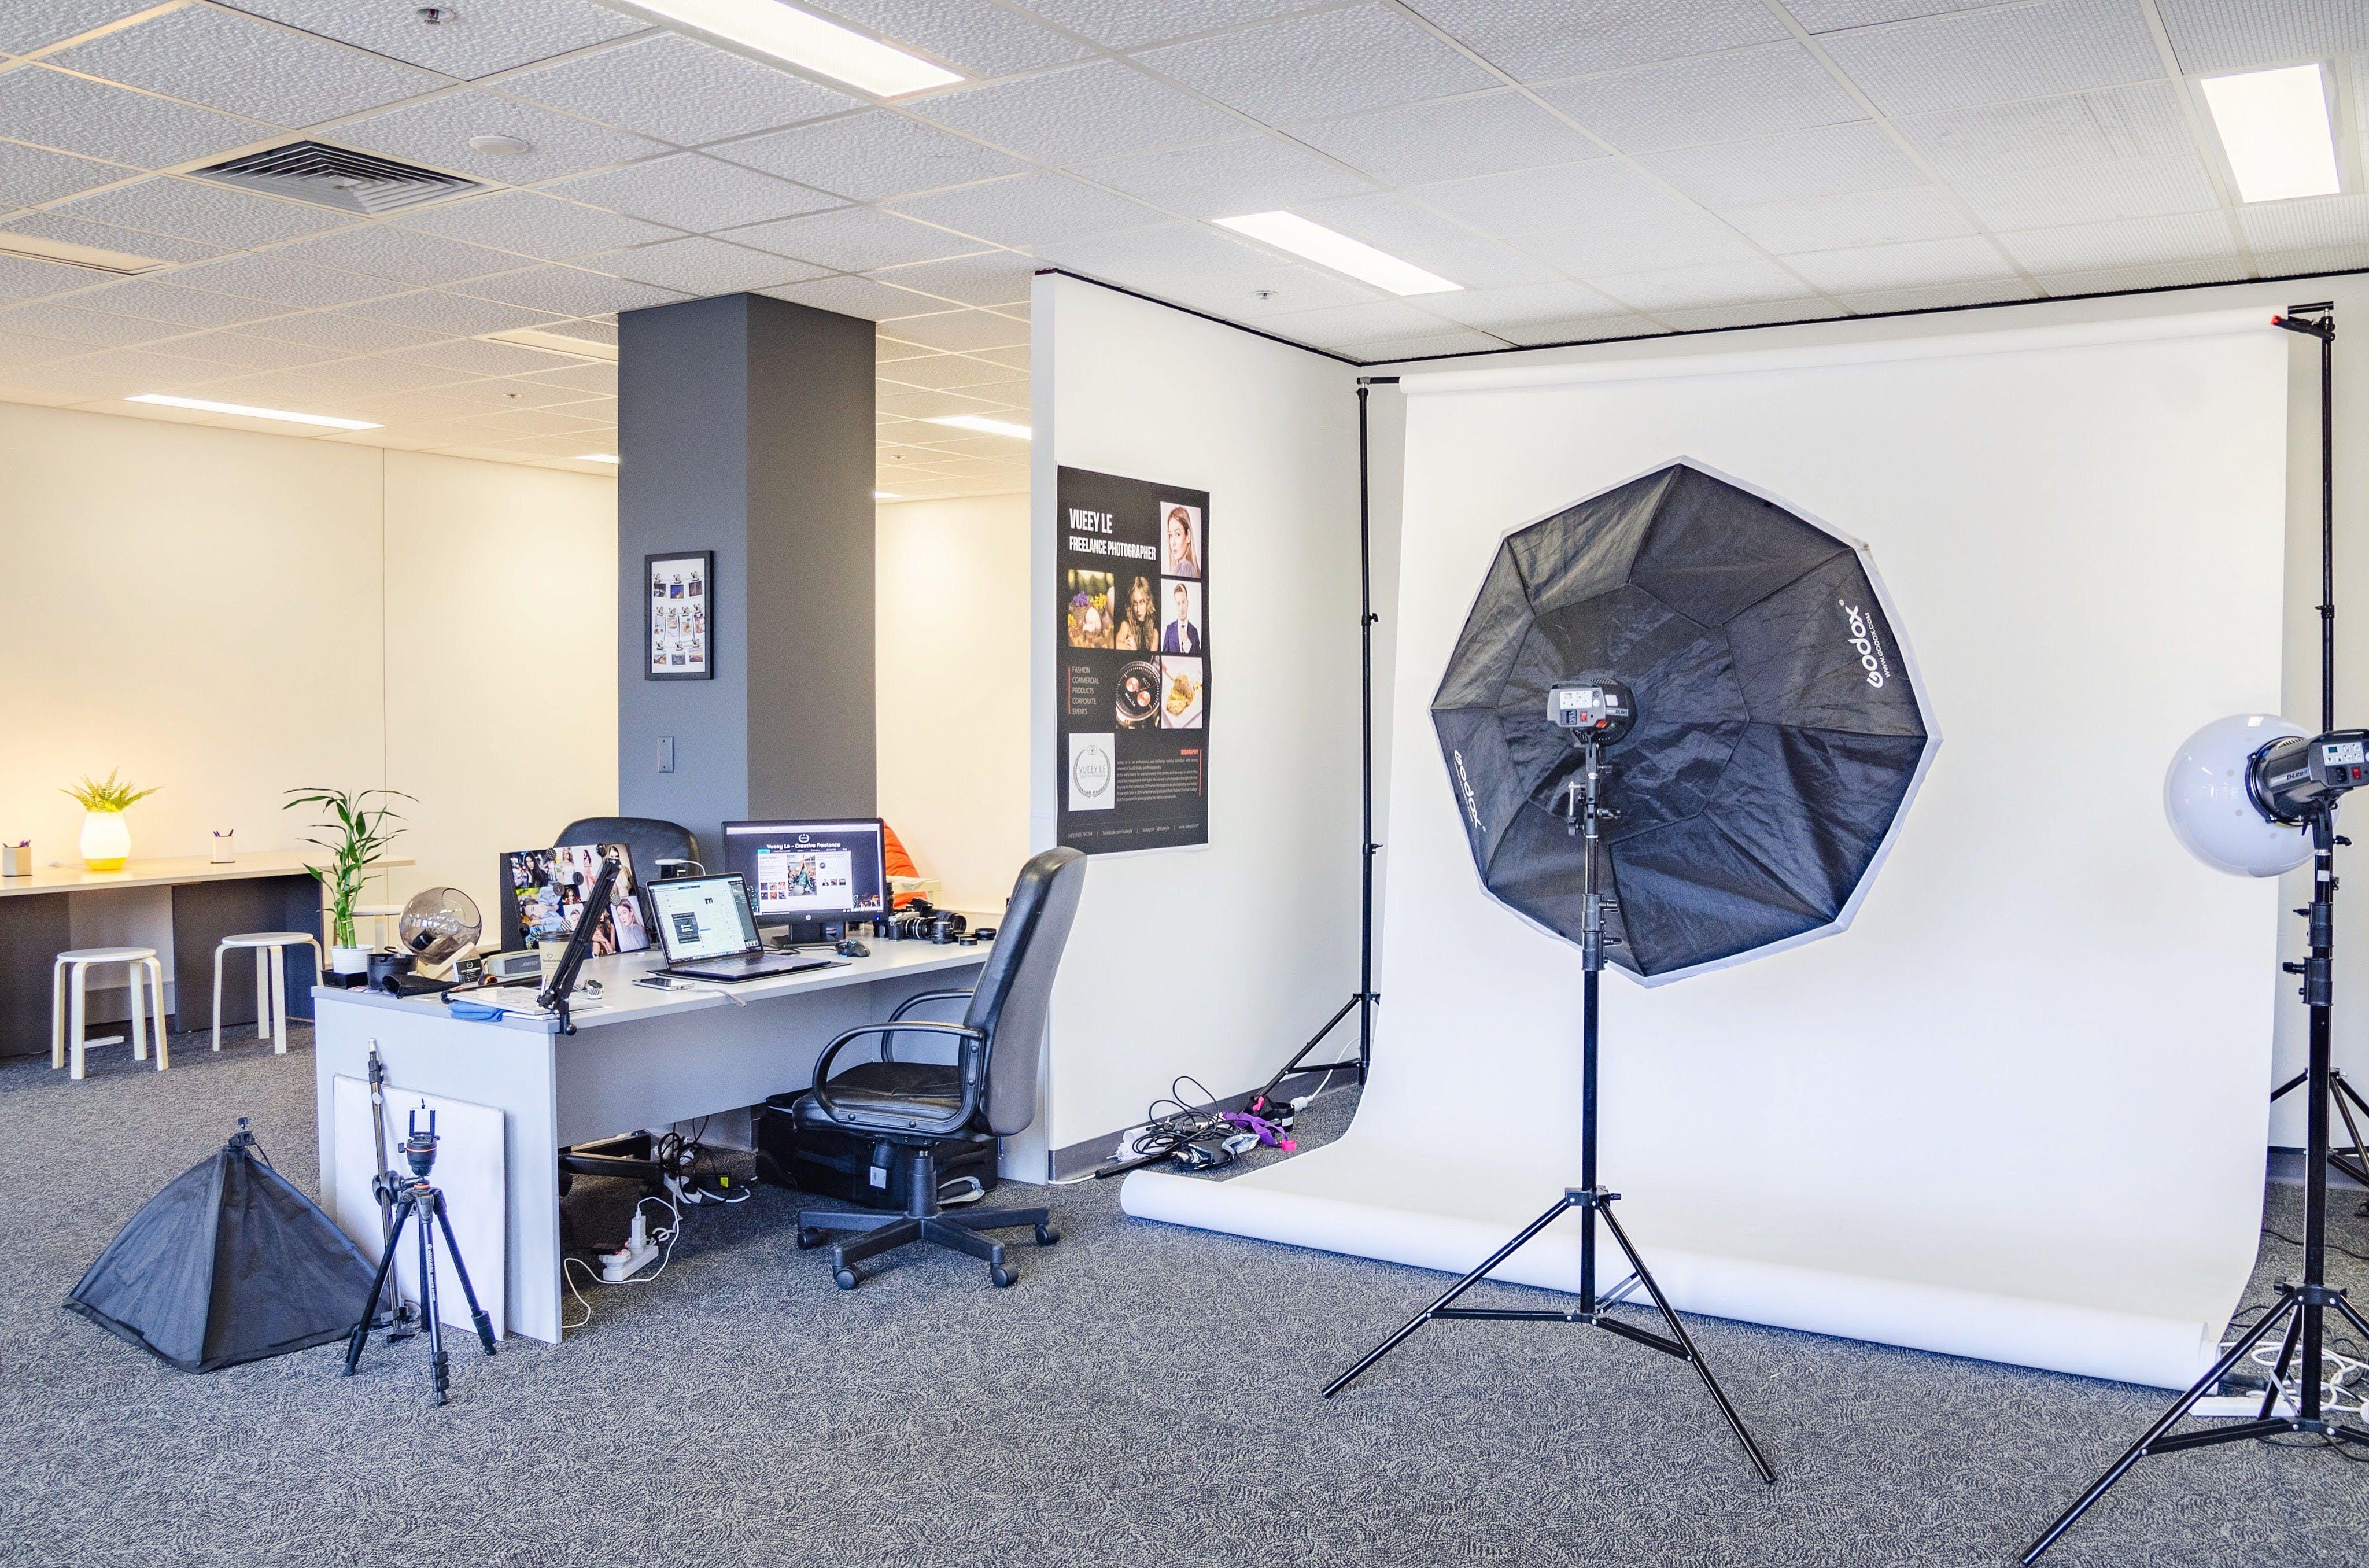 Photography Studio with Makeup Station, creative studio at Creative50 Hub, image 1